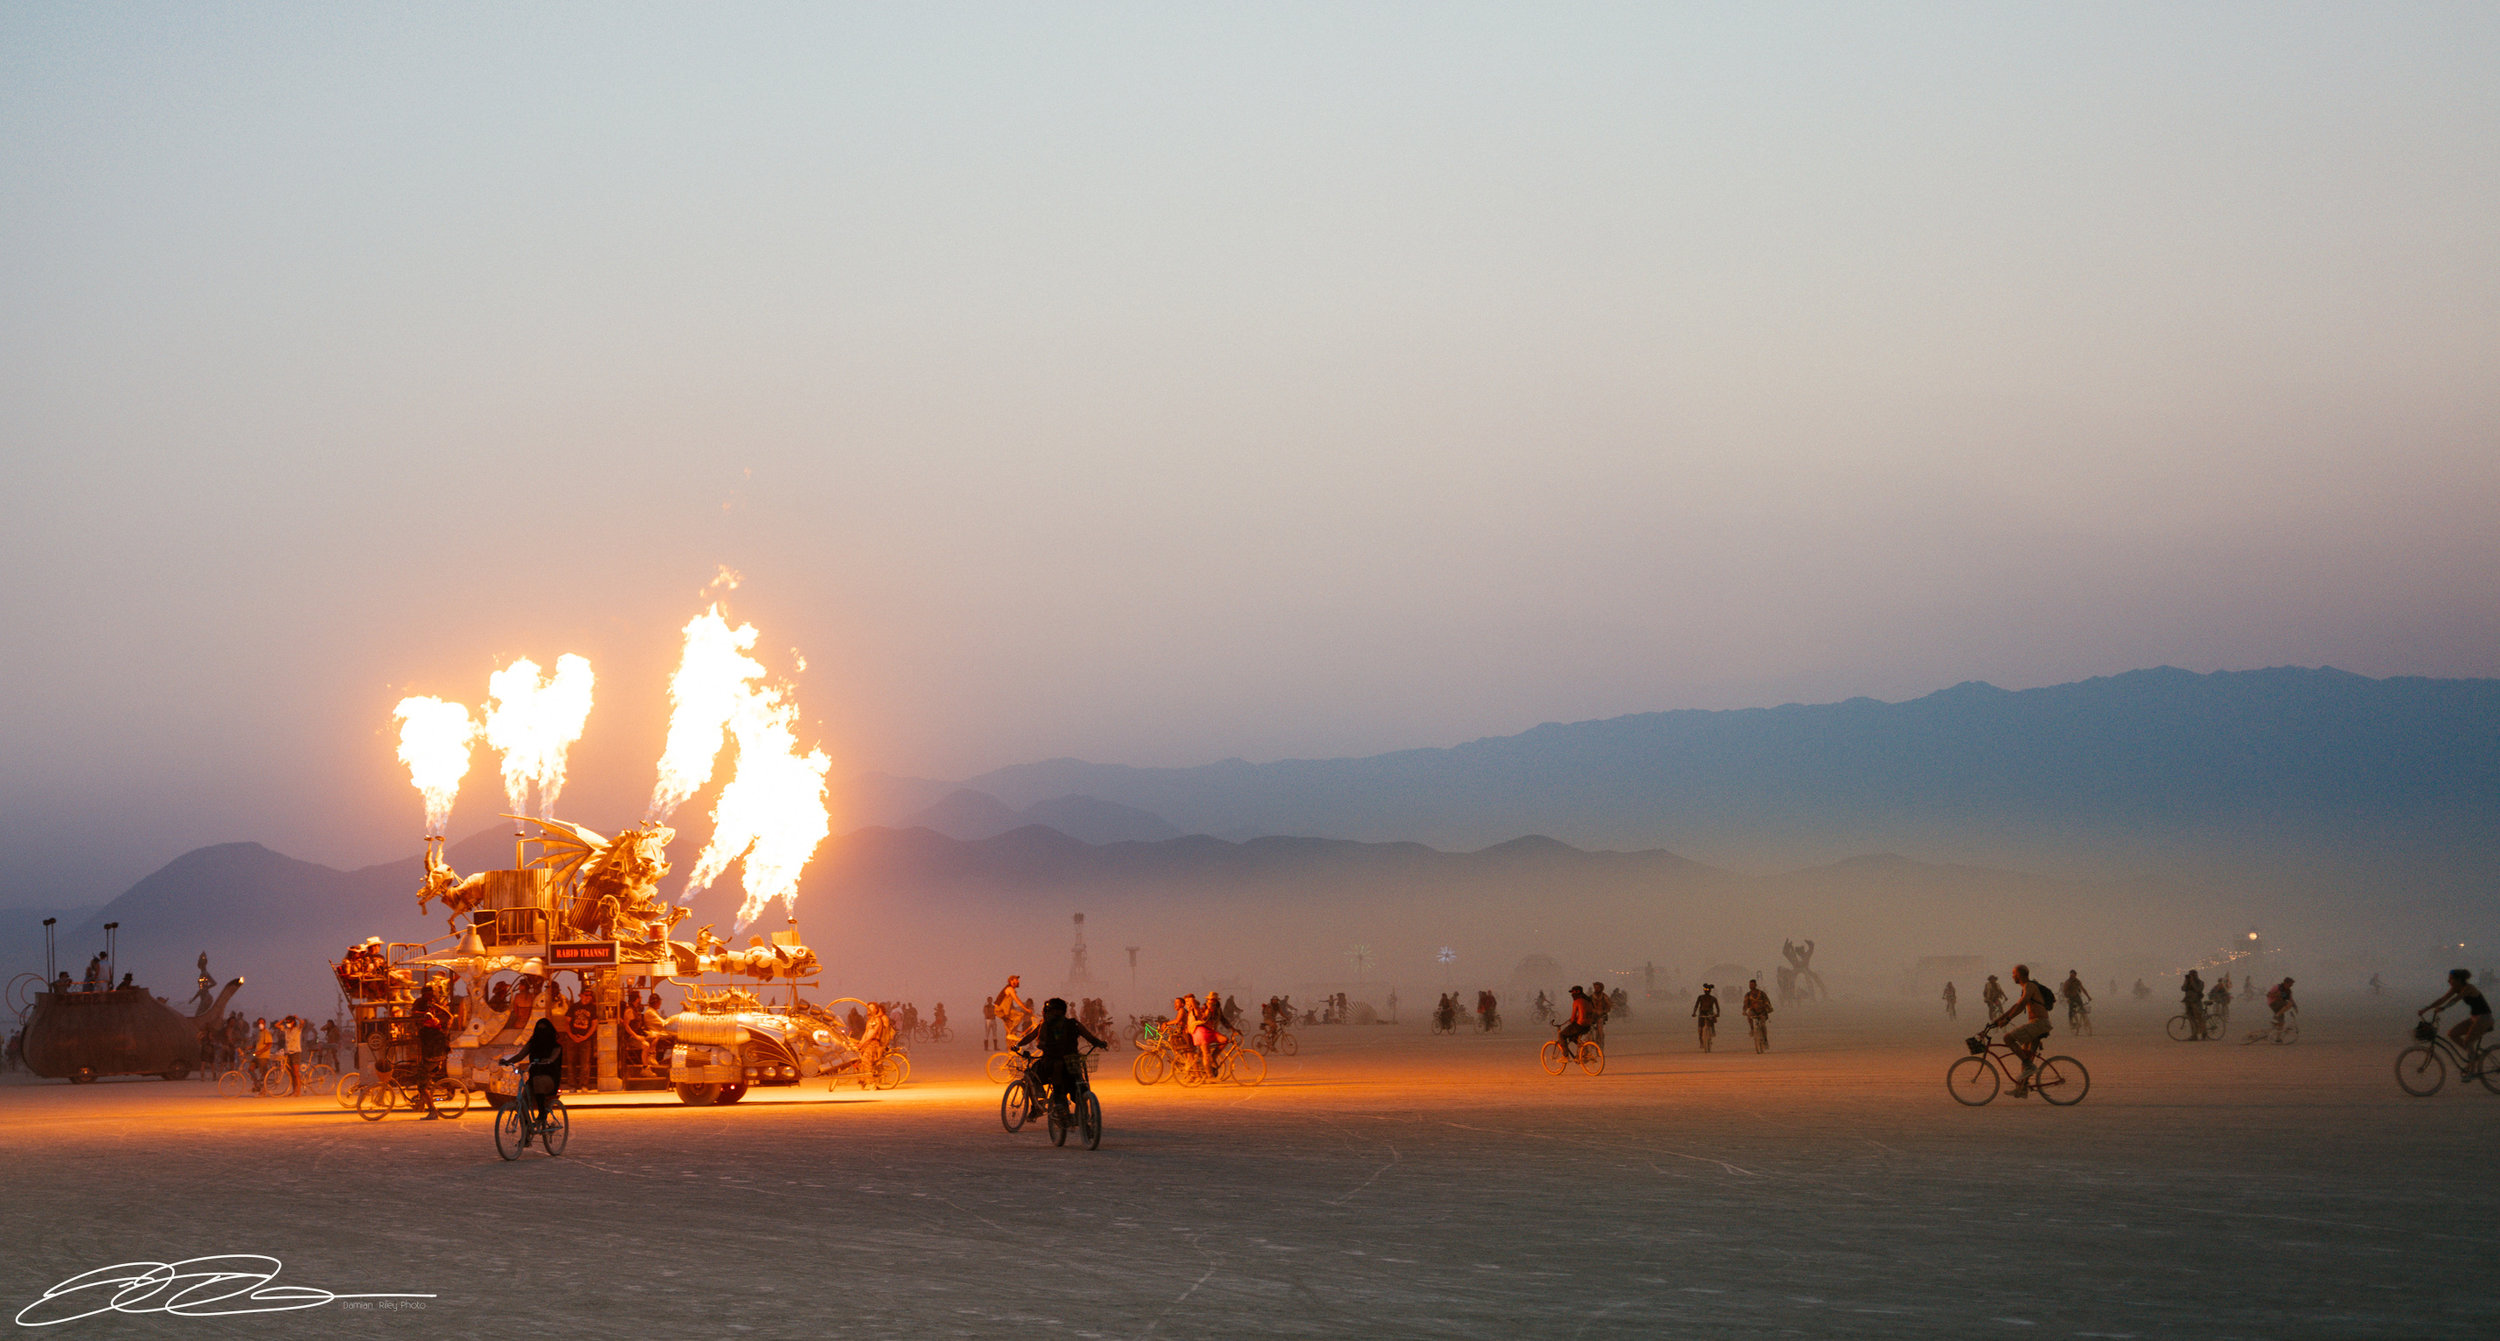 fire car burning man